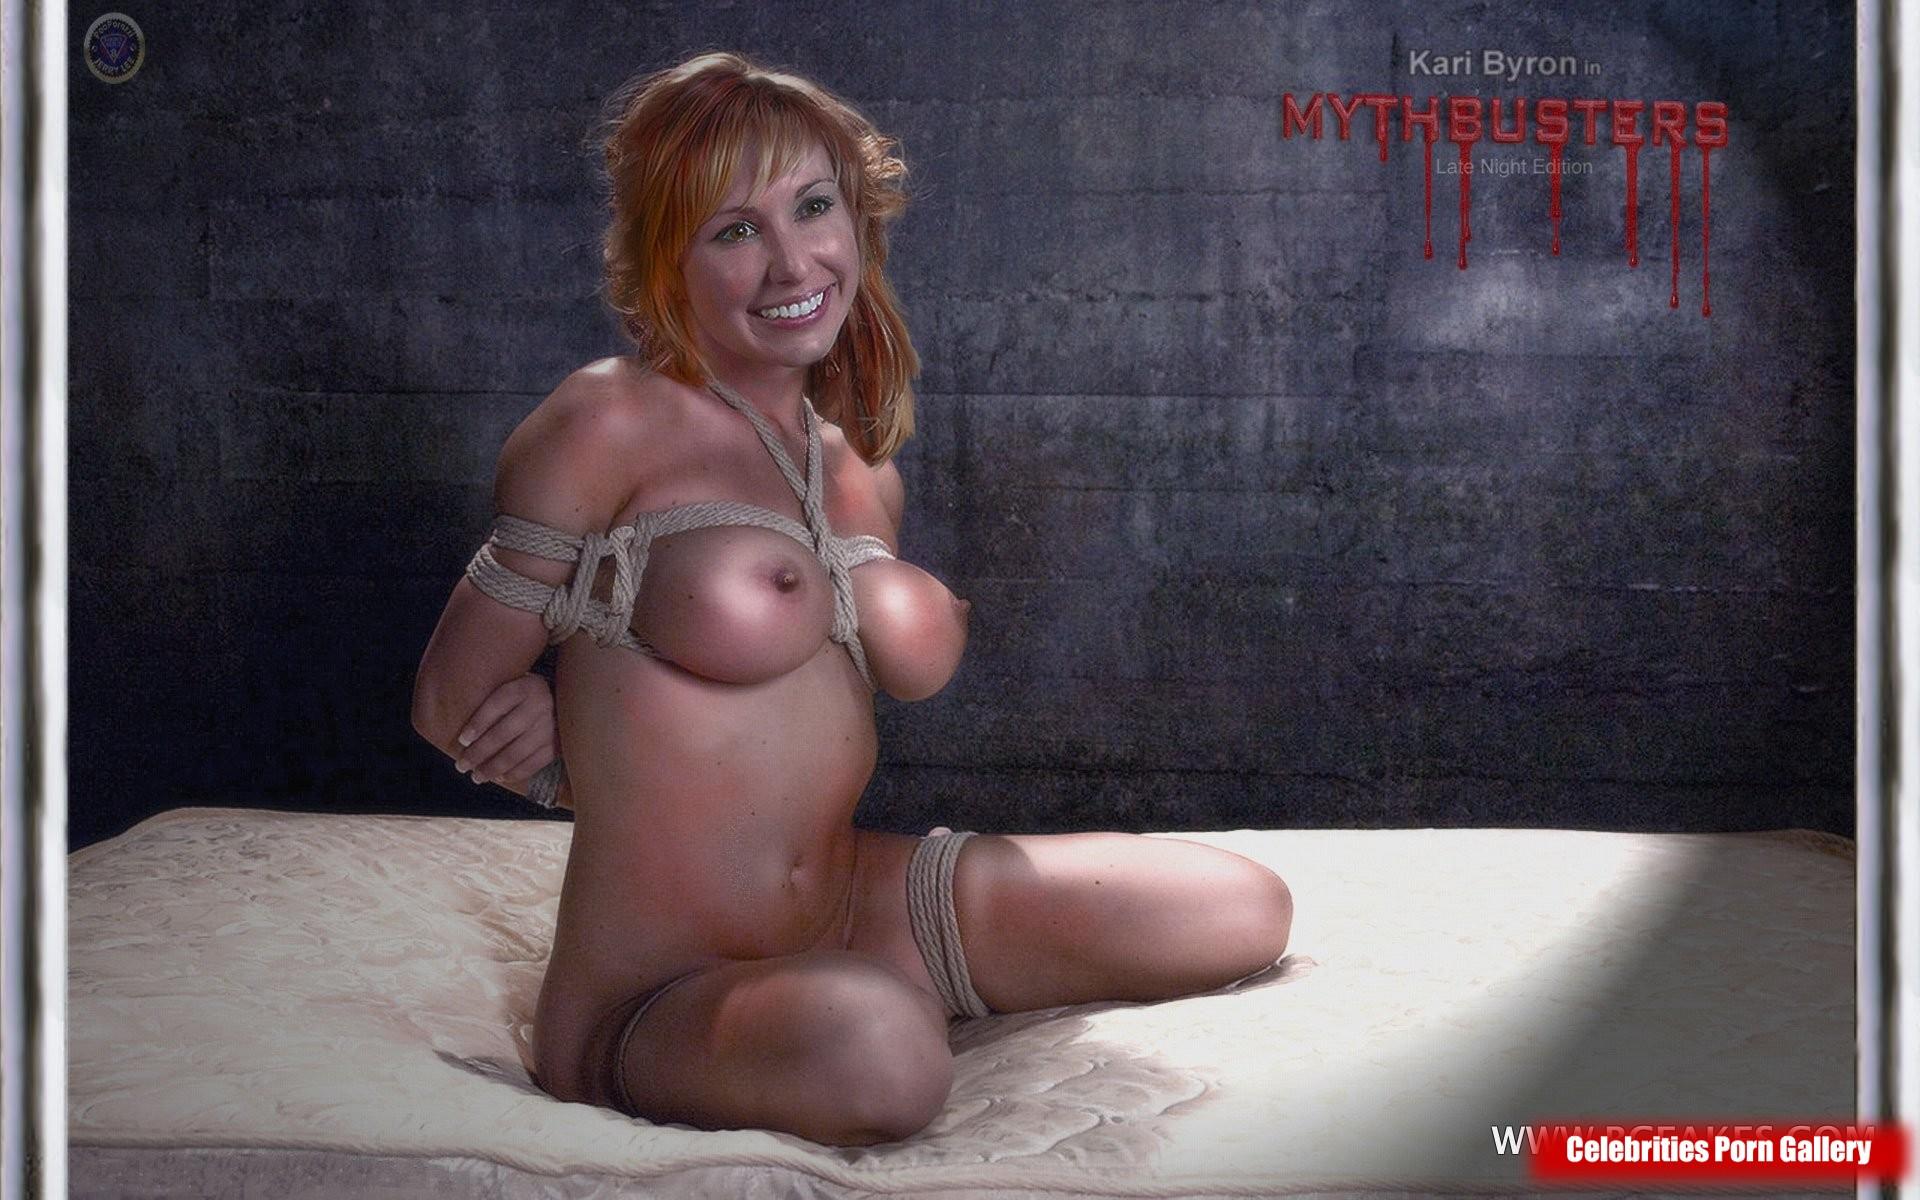 Kari byron mythbusters fakesx fake porn pics xxx hot sexy celeb nude girl photo full galleries naked